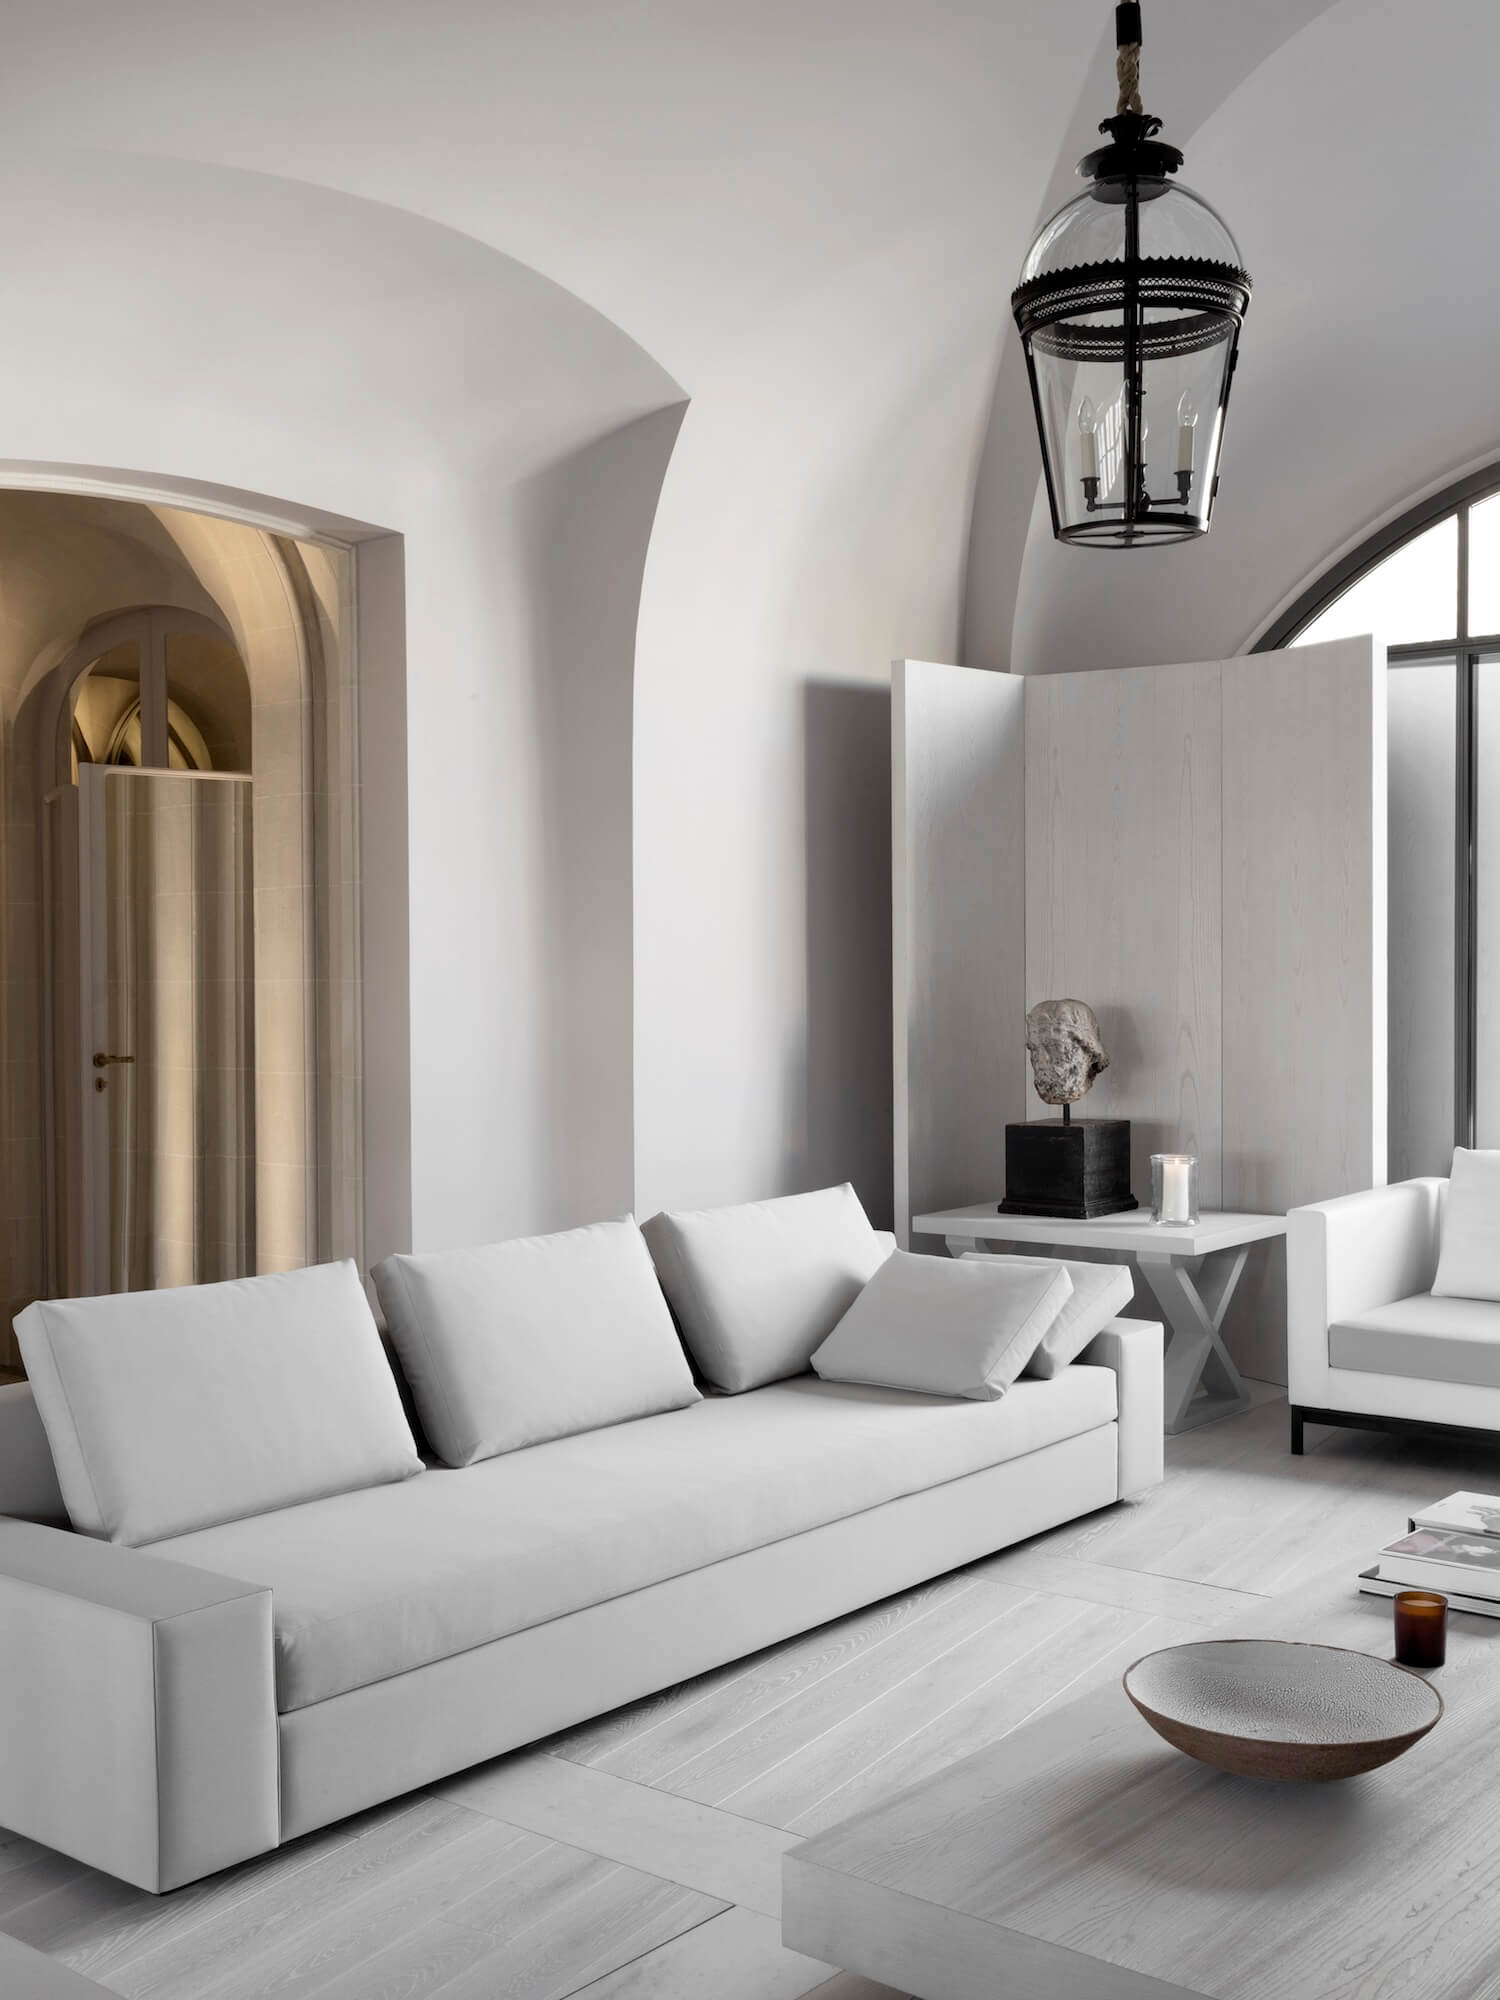 phong cách tối giản elledecoration vietnam-paris-apartment-guillaume-alan 5